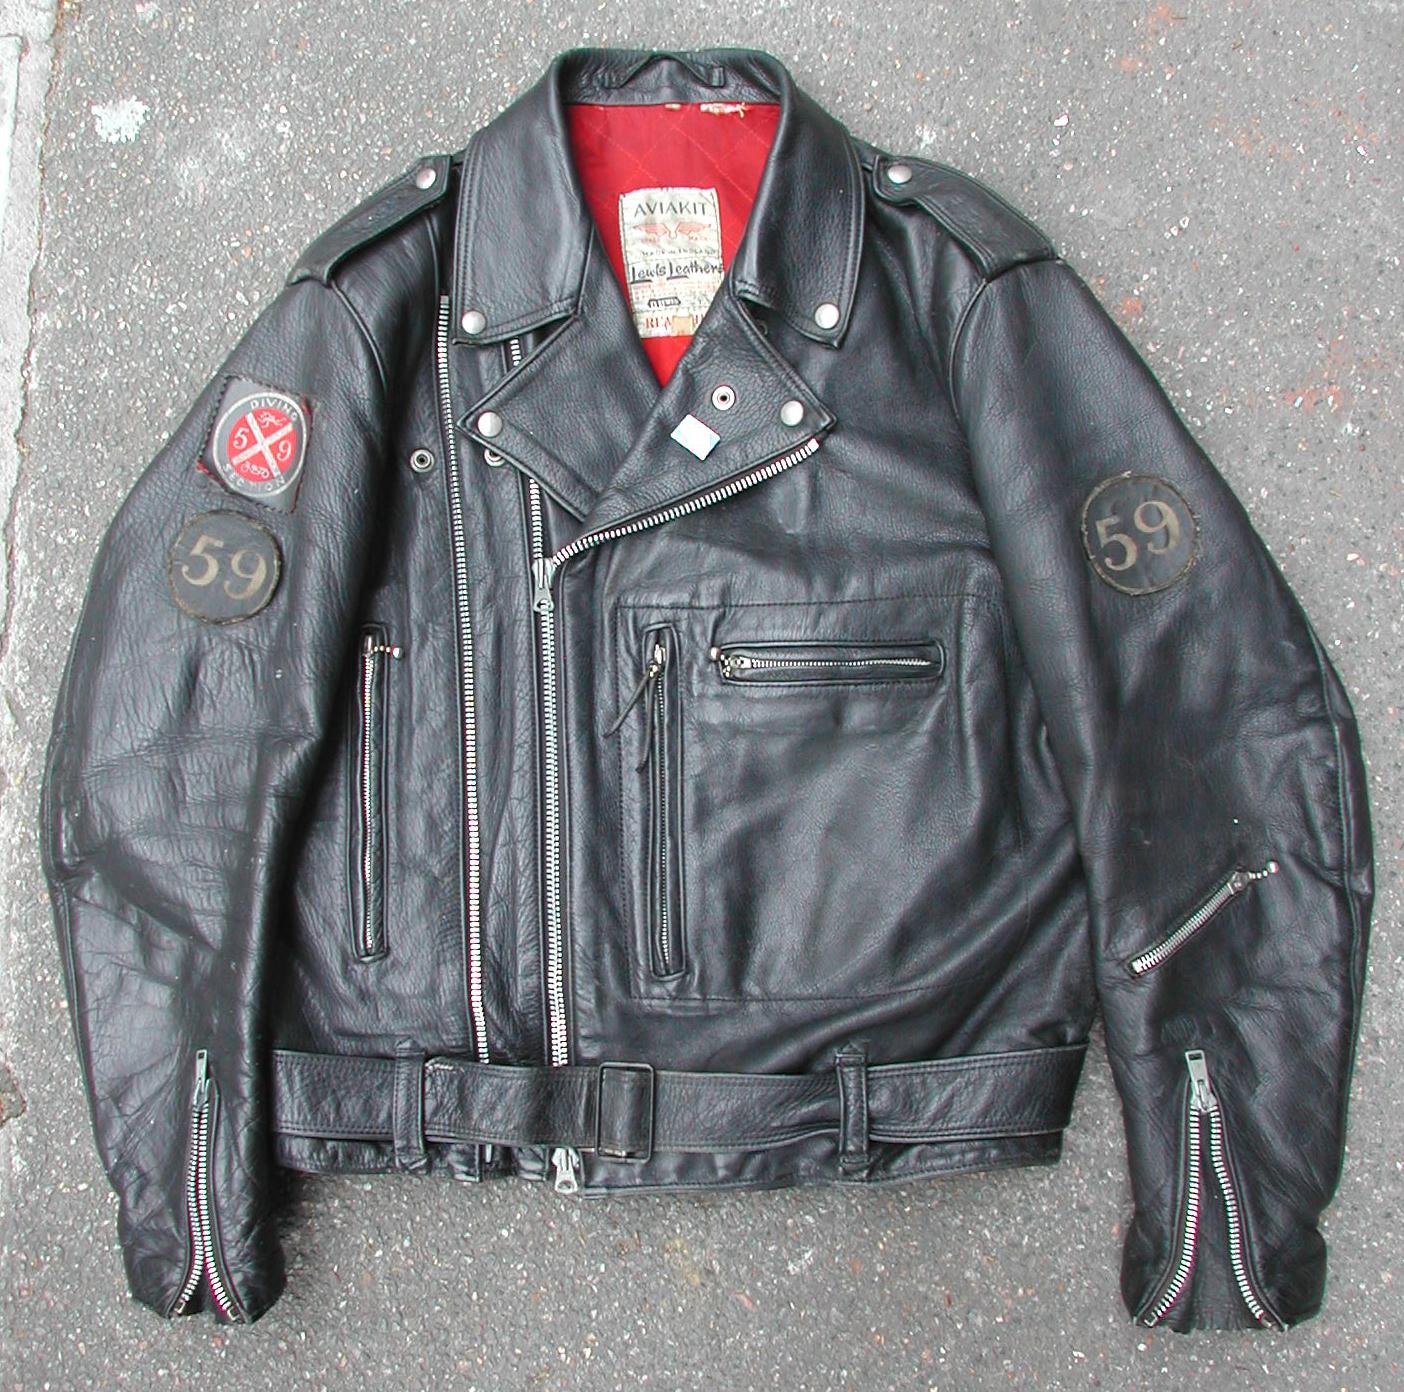 Lewis leather jacket